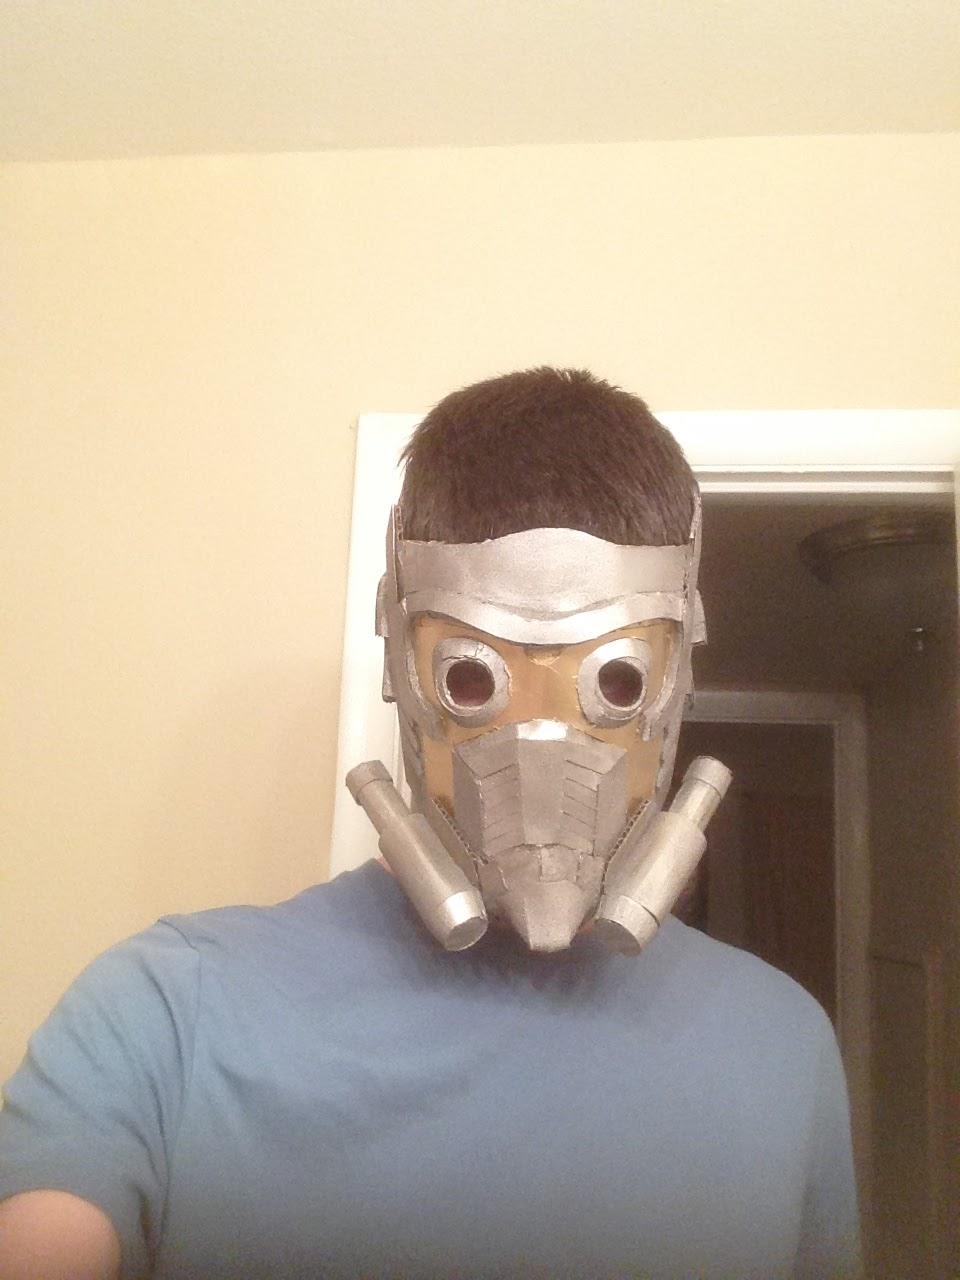 halloweenworks diy star lord cardboard mask